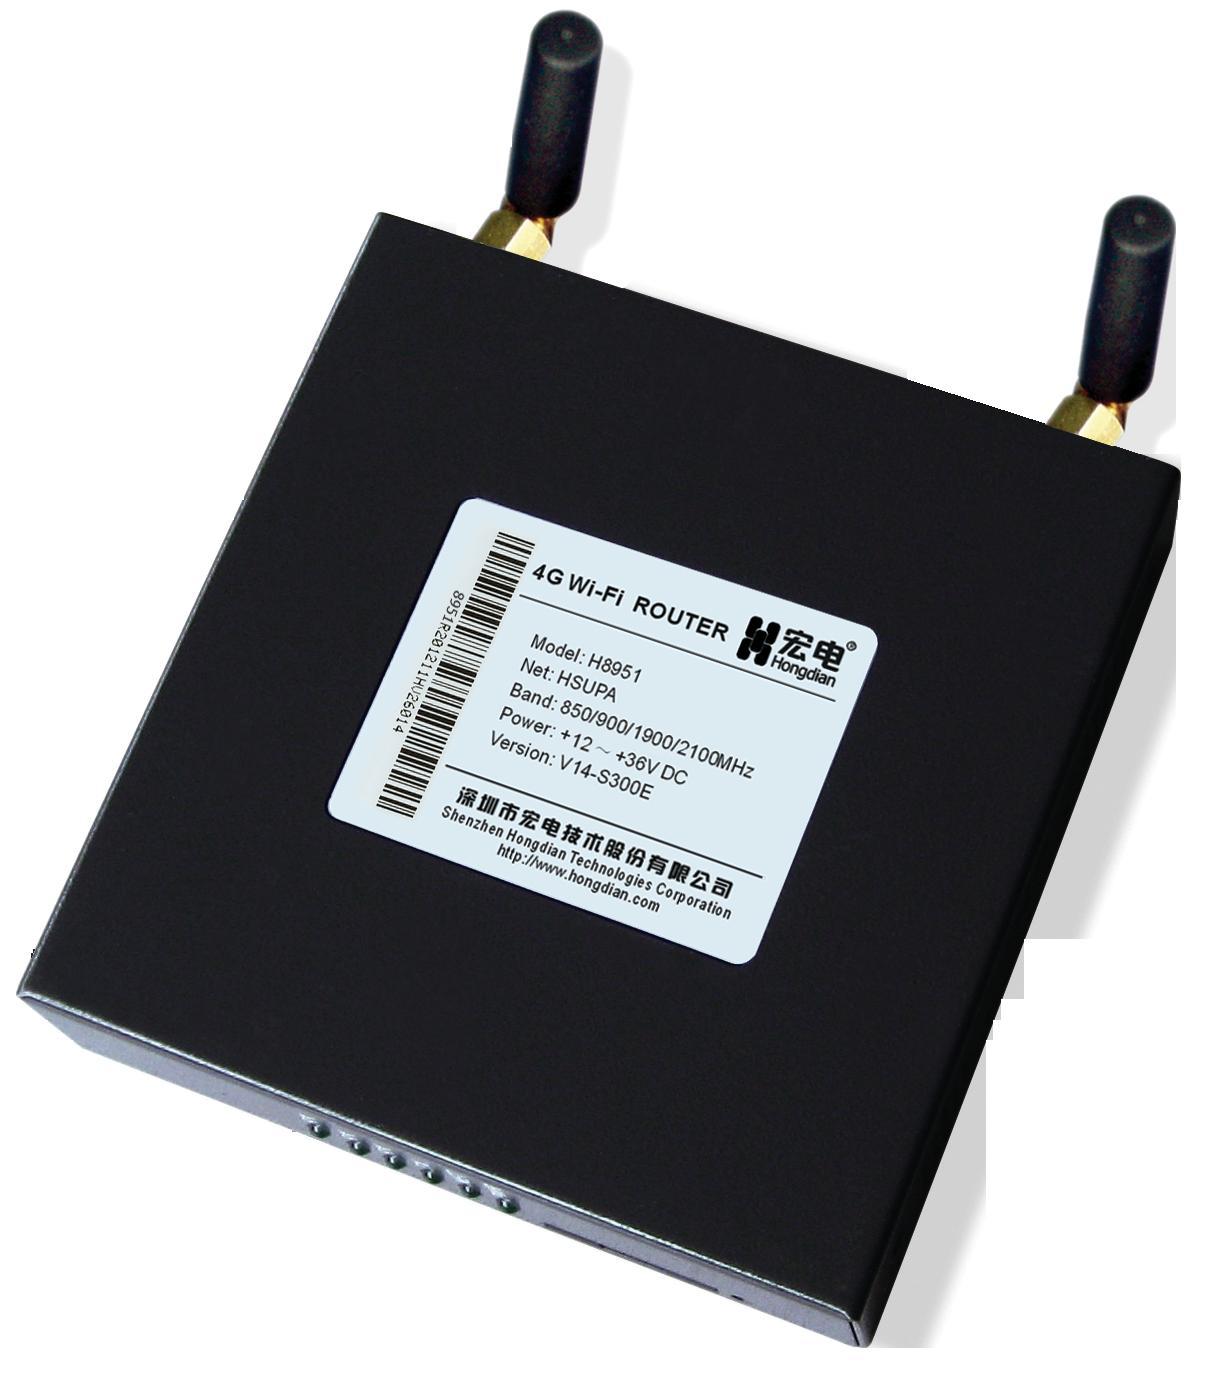 H8951 4G无线路由器支持TDD LTE、FDD LTE等4G网络、HSPA+等3G+网络,支持TD-SCDMA、EVDO、WCDMA等3G网络,同时支持802.11b/g/n,速率最高可达150Mbps。H8951 4G无线路由器采用高性能32位MIPS处理器,基于通用基础平台、模块化设计,内置国内外主流无线3G/3G+/4G LTE模块,采用嵌入式操作系统,并针对无线网络的不稳定性、延时变化较大等特点进行了优化设计,为您提供高速可靠的路由及数据传输功能,支持两个以太网接口,更好的满足自助终端机、广